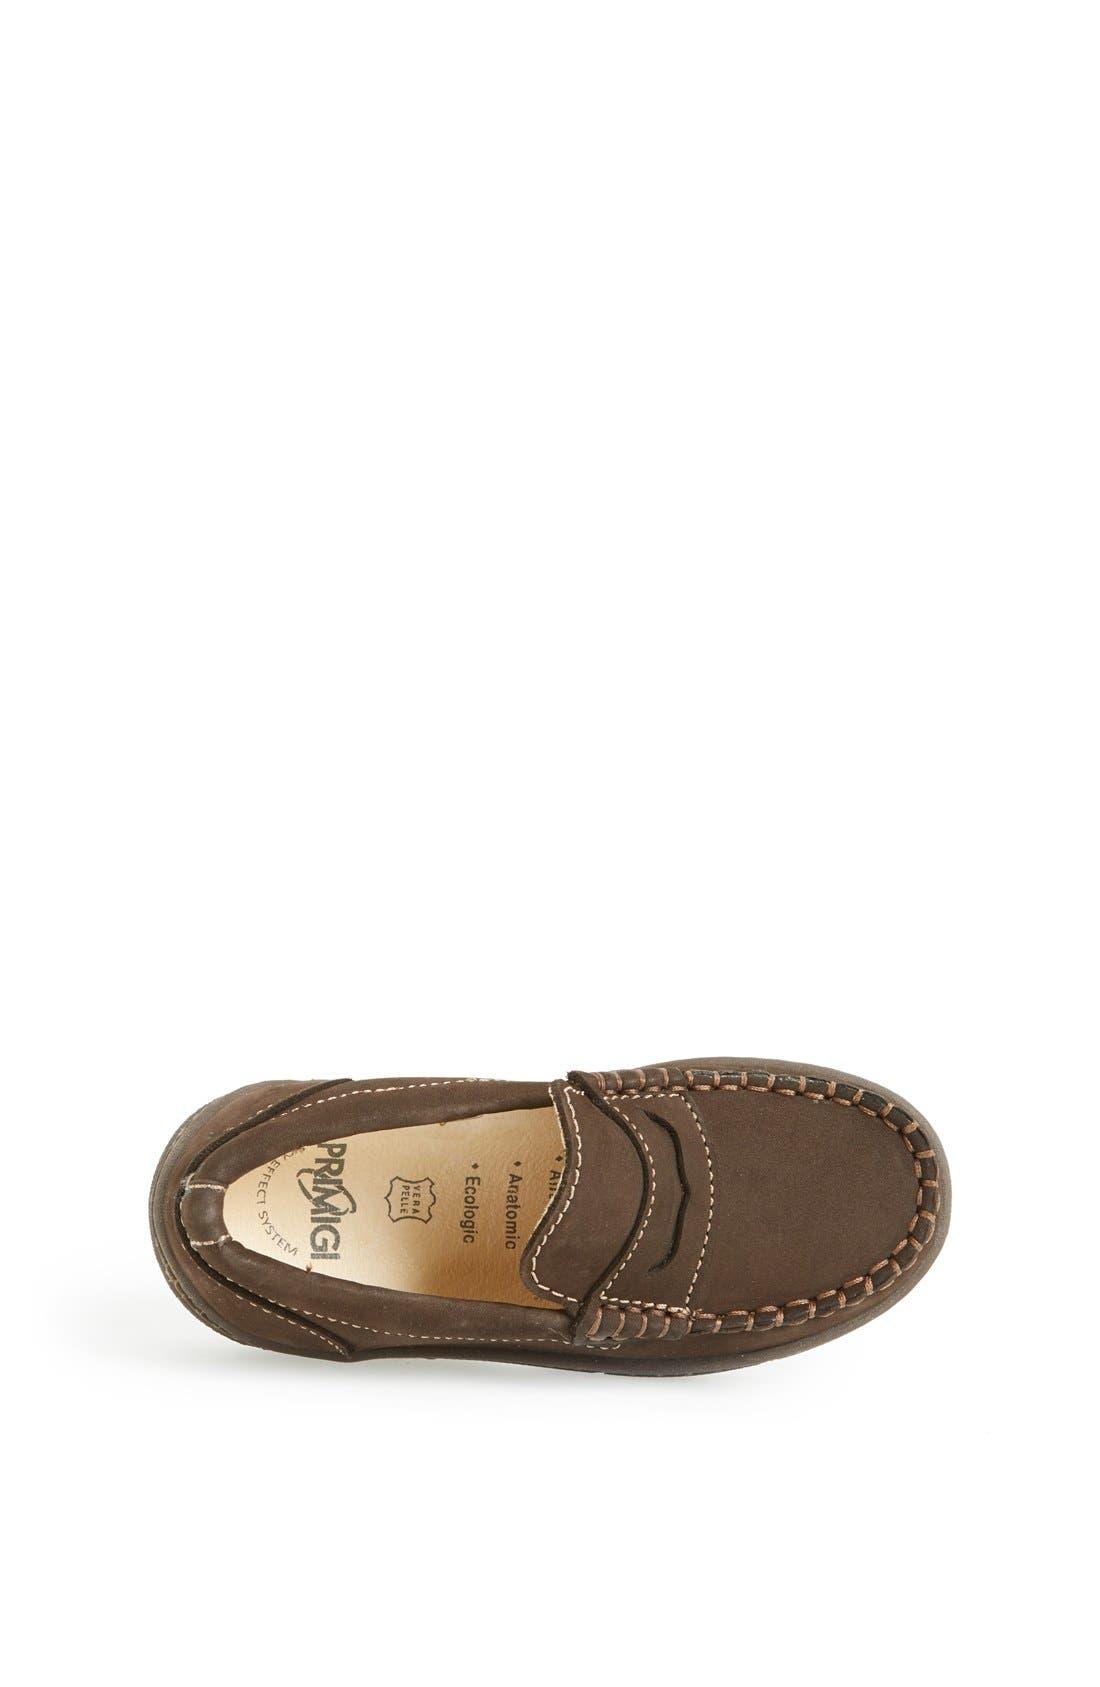 PRIMIGI,                             'Choate' Slip-On Loafer,                             Alternate thumbnail 3, color,                             210